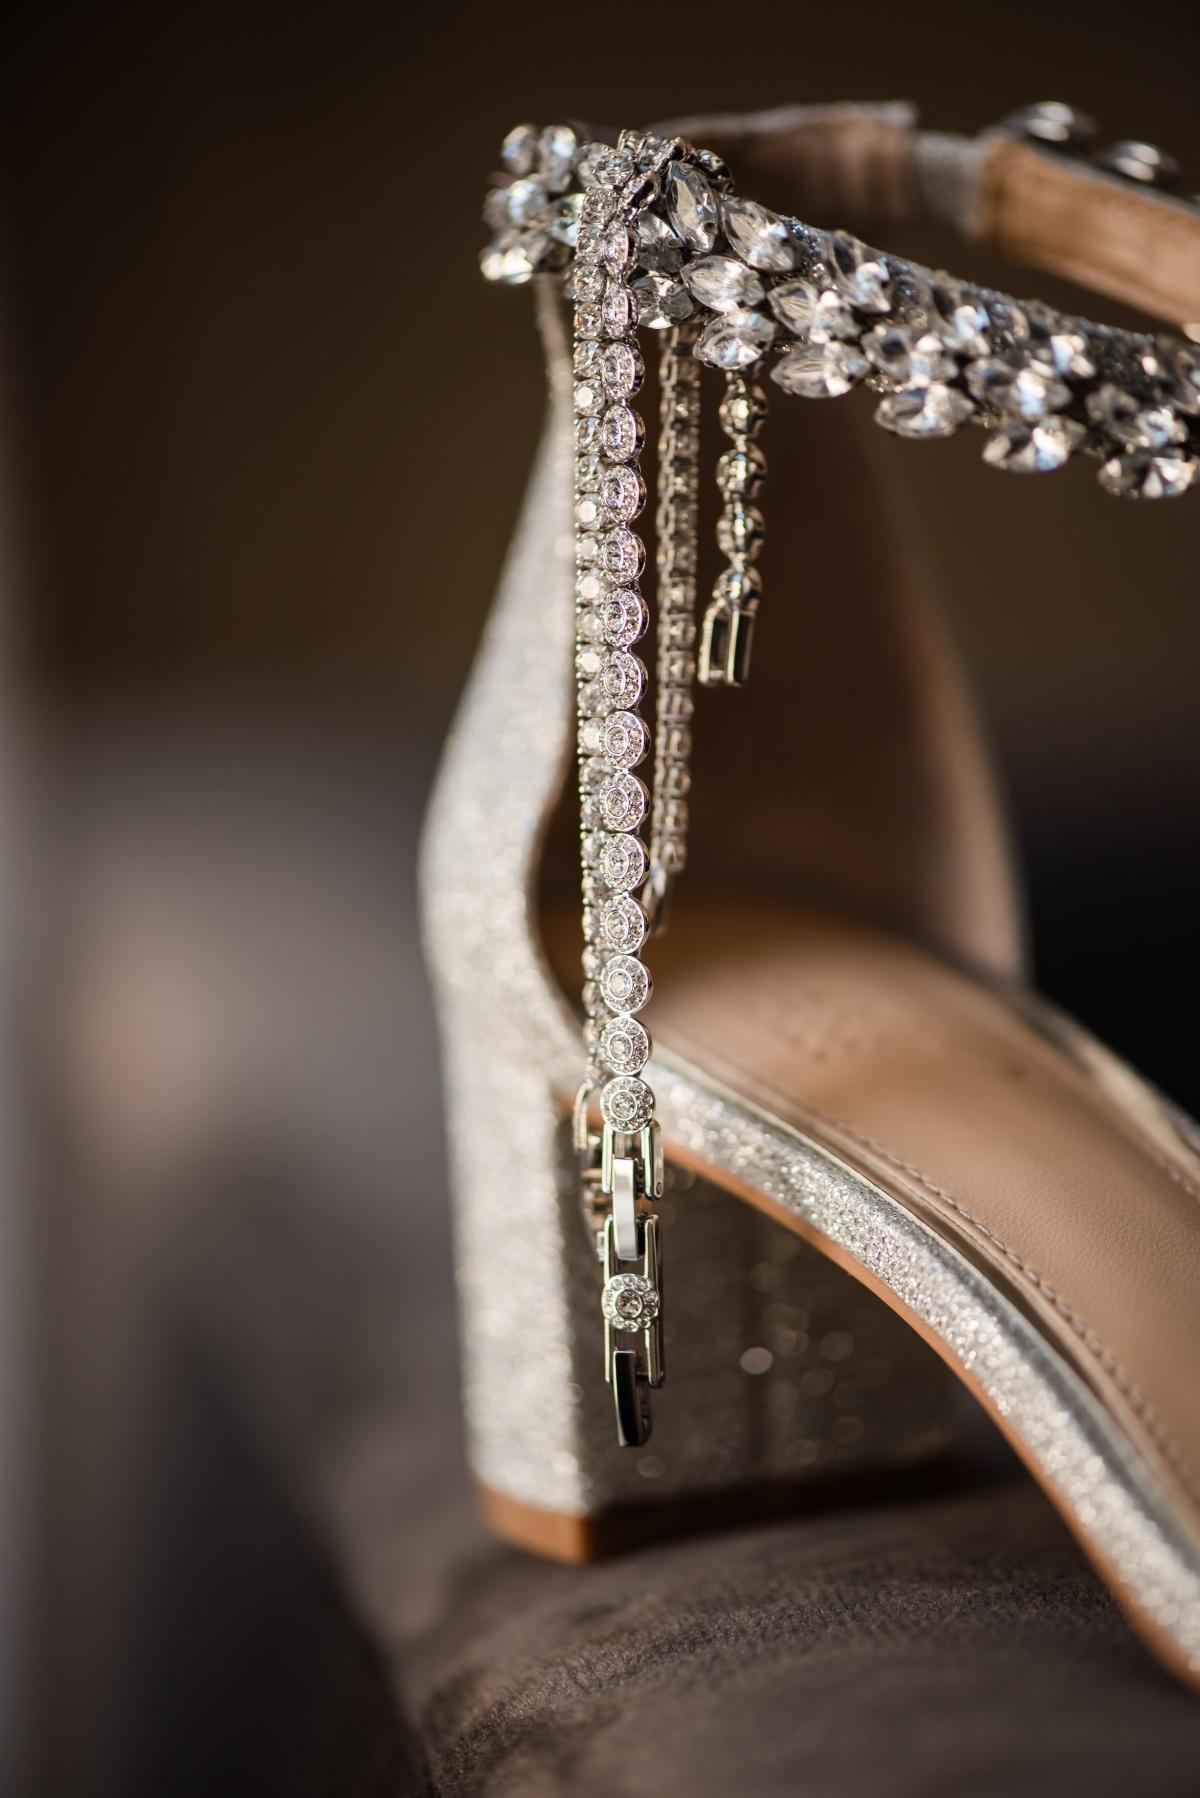 9 19 20 Lori Tiff Wedding 034